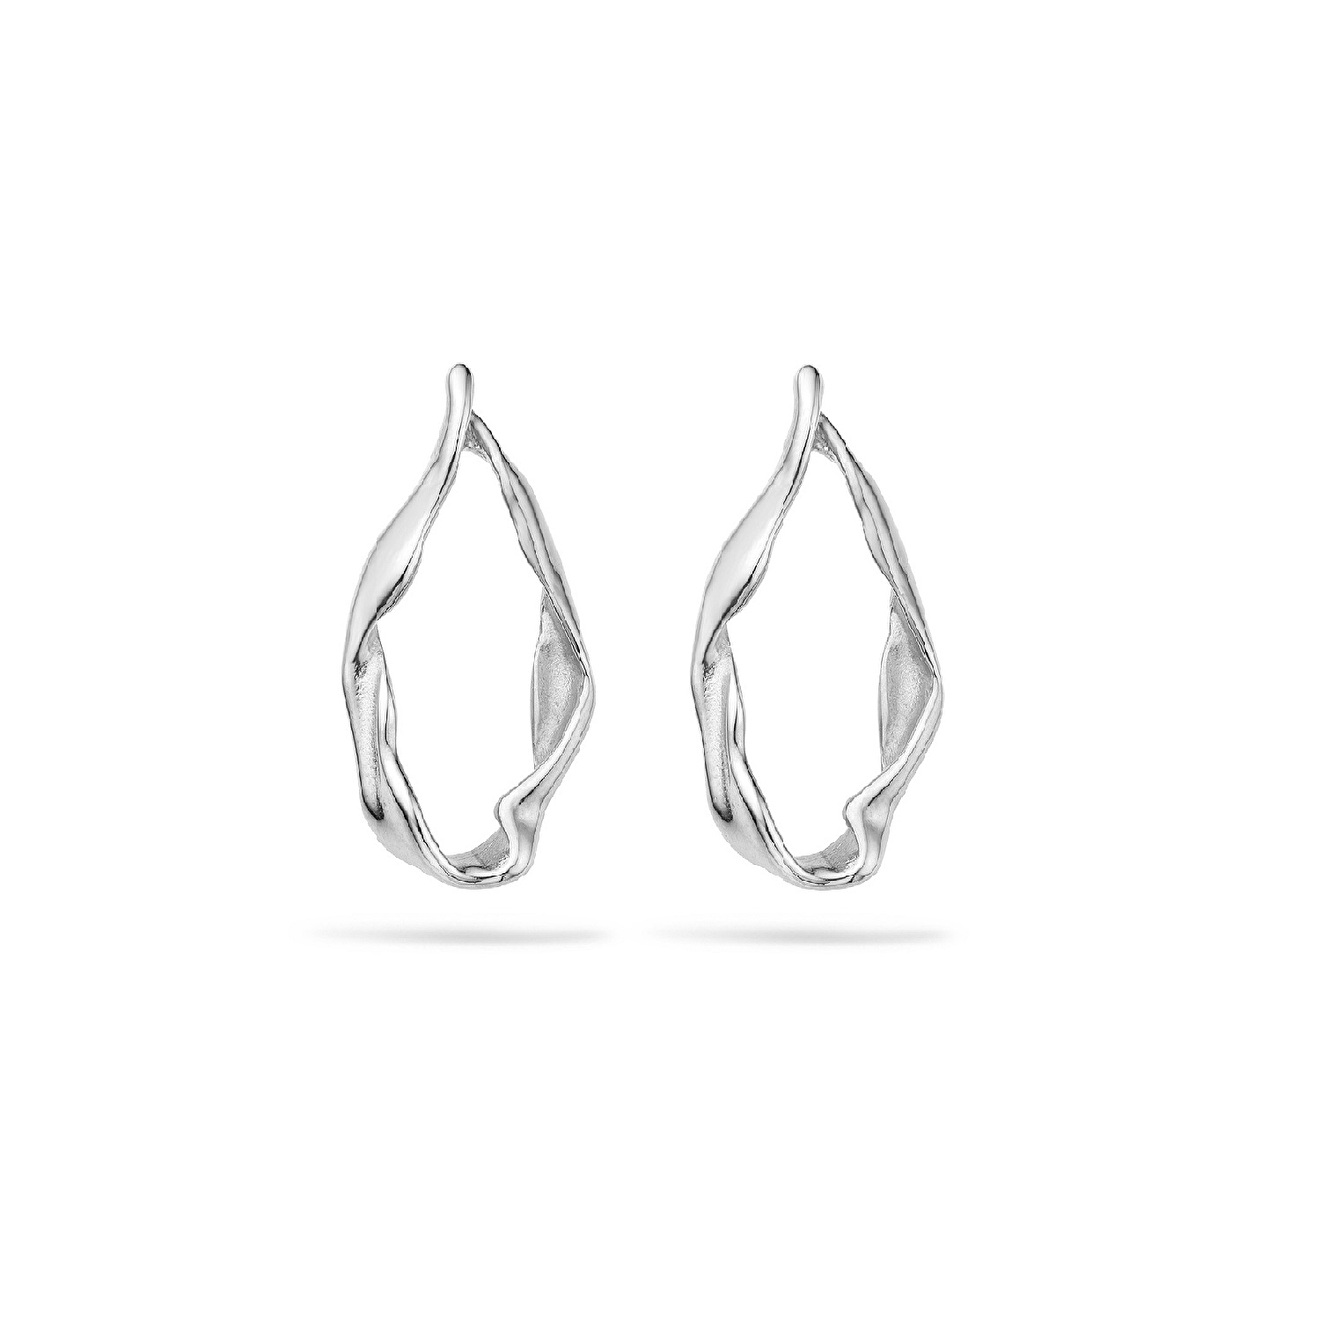 Mya Bay Покрытые серебром серьги-овалы Jenna